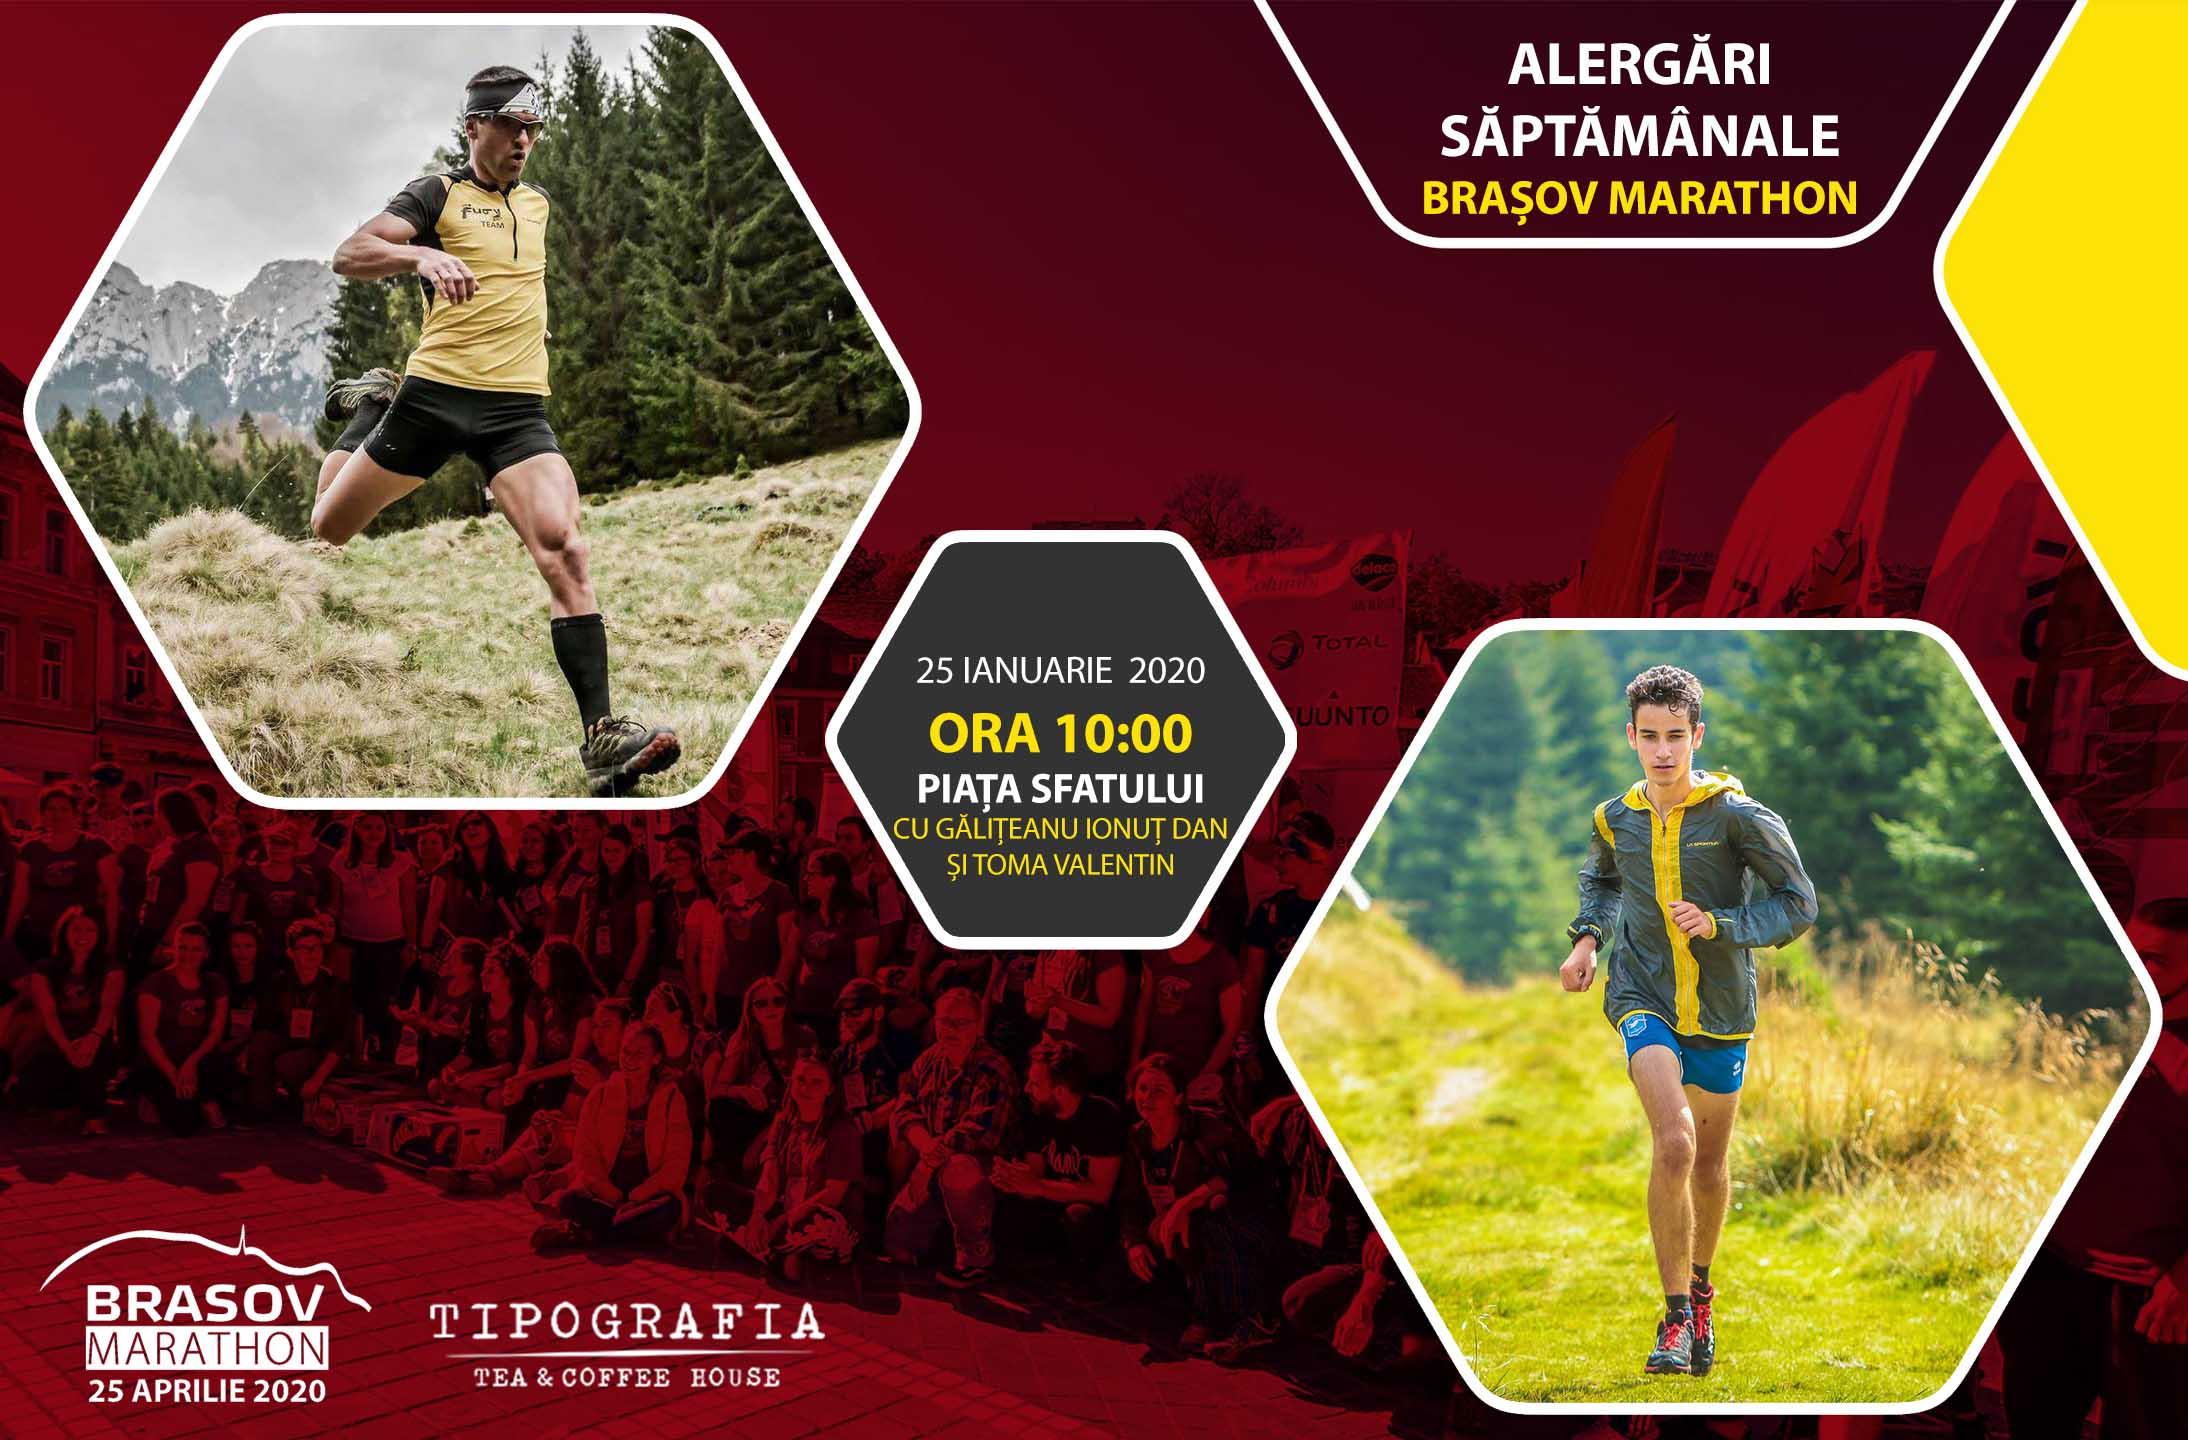 Brasov_marathon ALERGARE 25 IANUARIE 2020 redimensionata